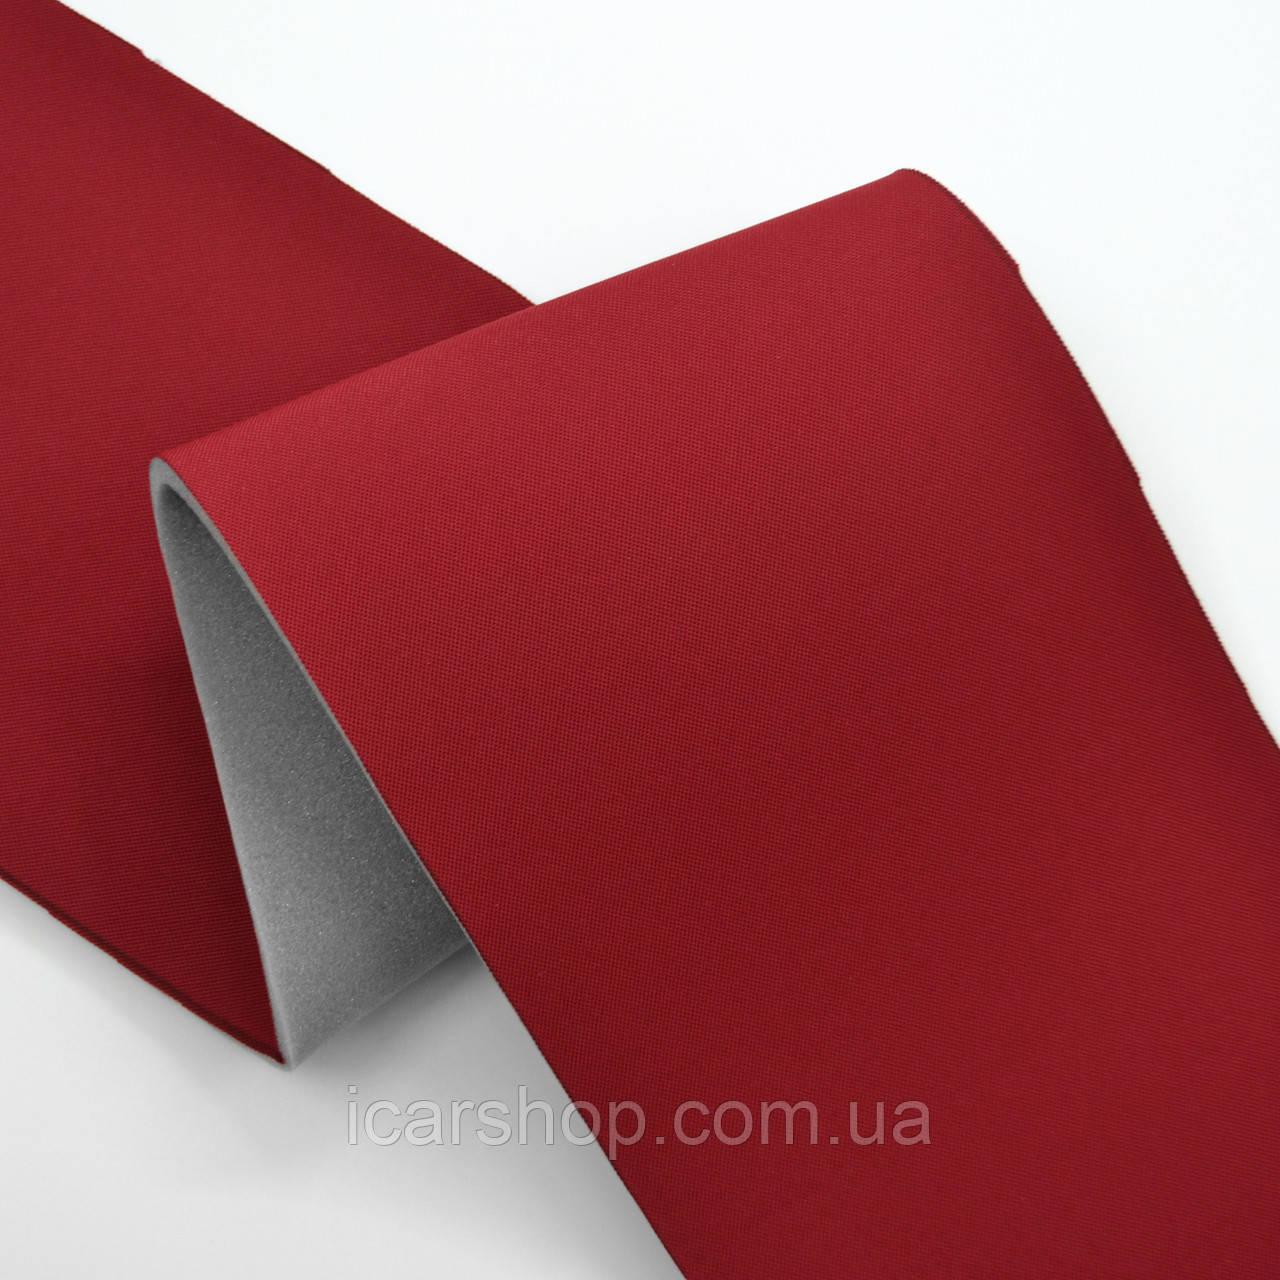 Ткань 806 (1,6м) / Красная / На поролоне 5мм